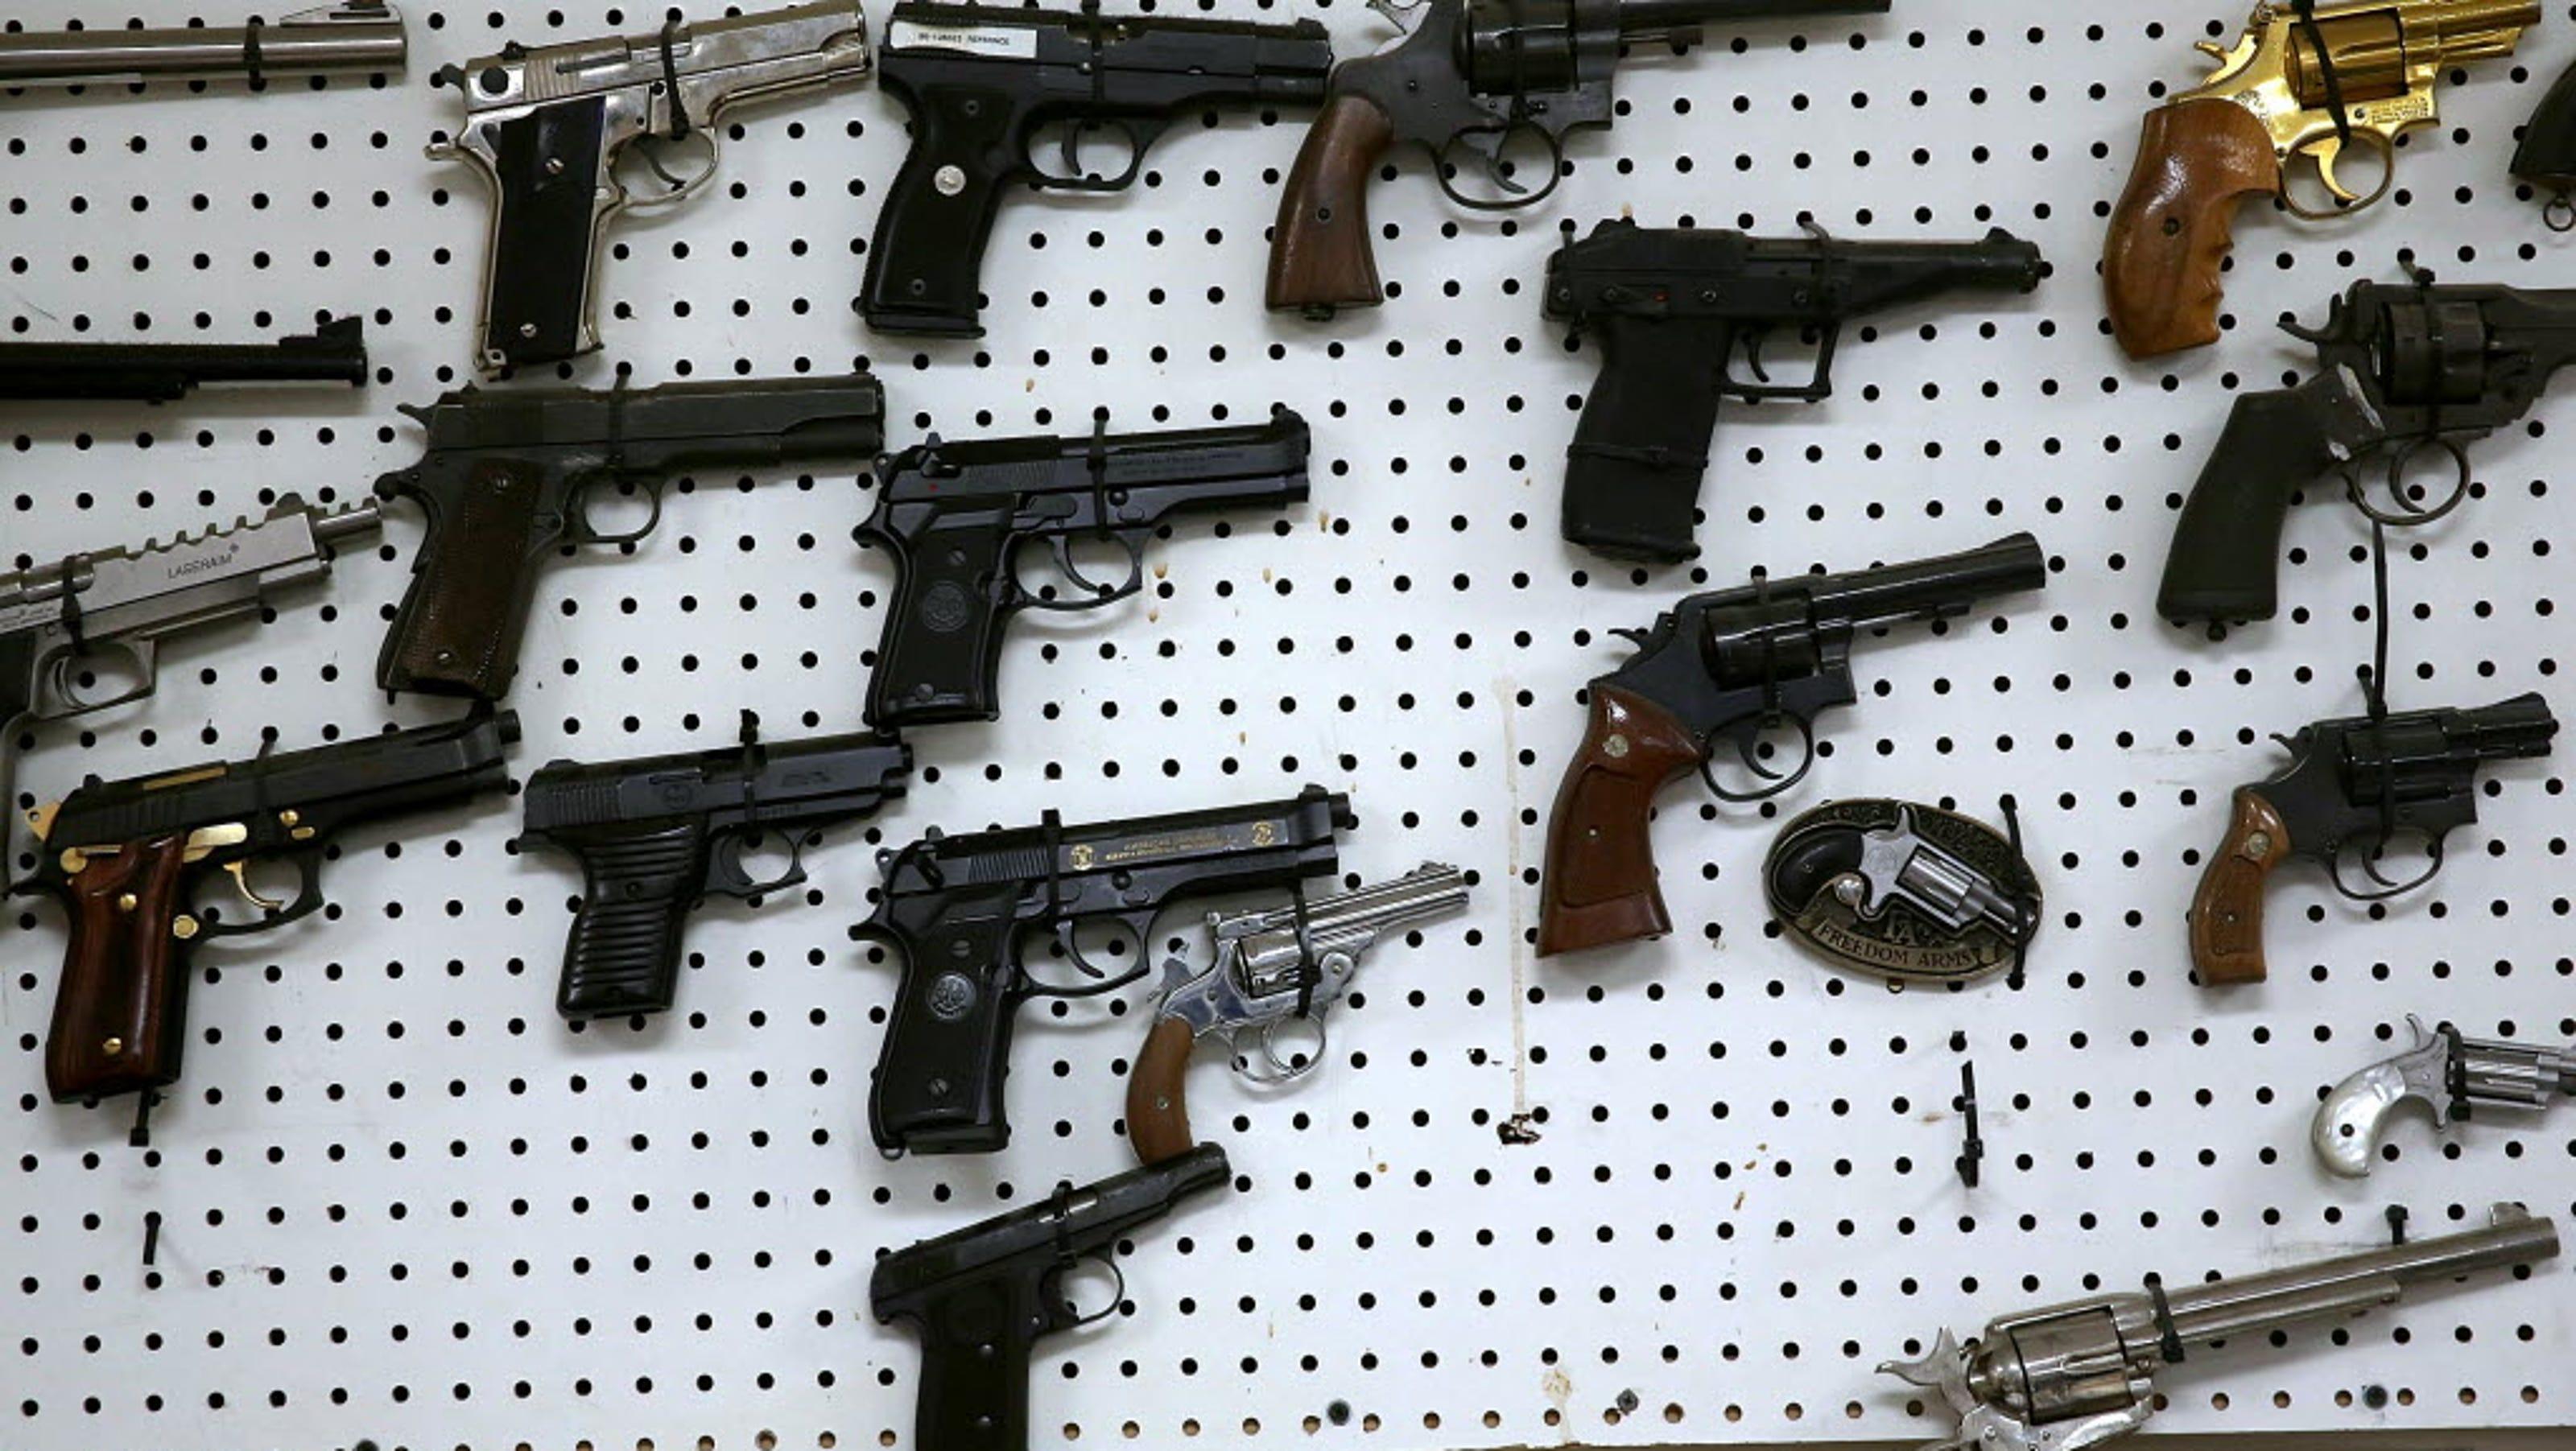 Carrying a gun way worse than beating your wife: Column